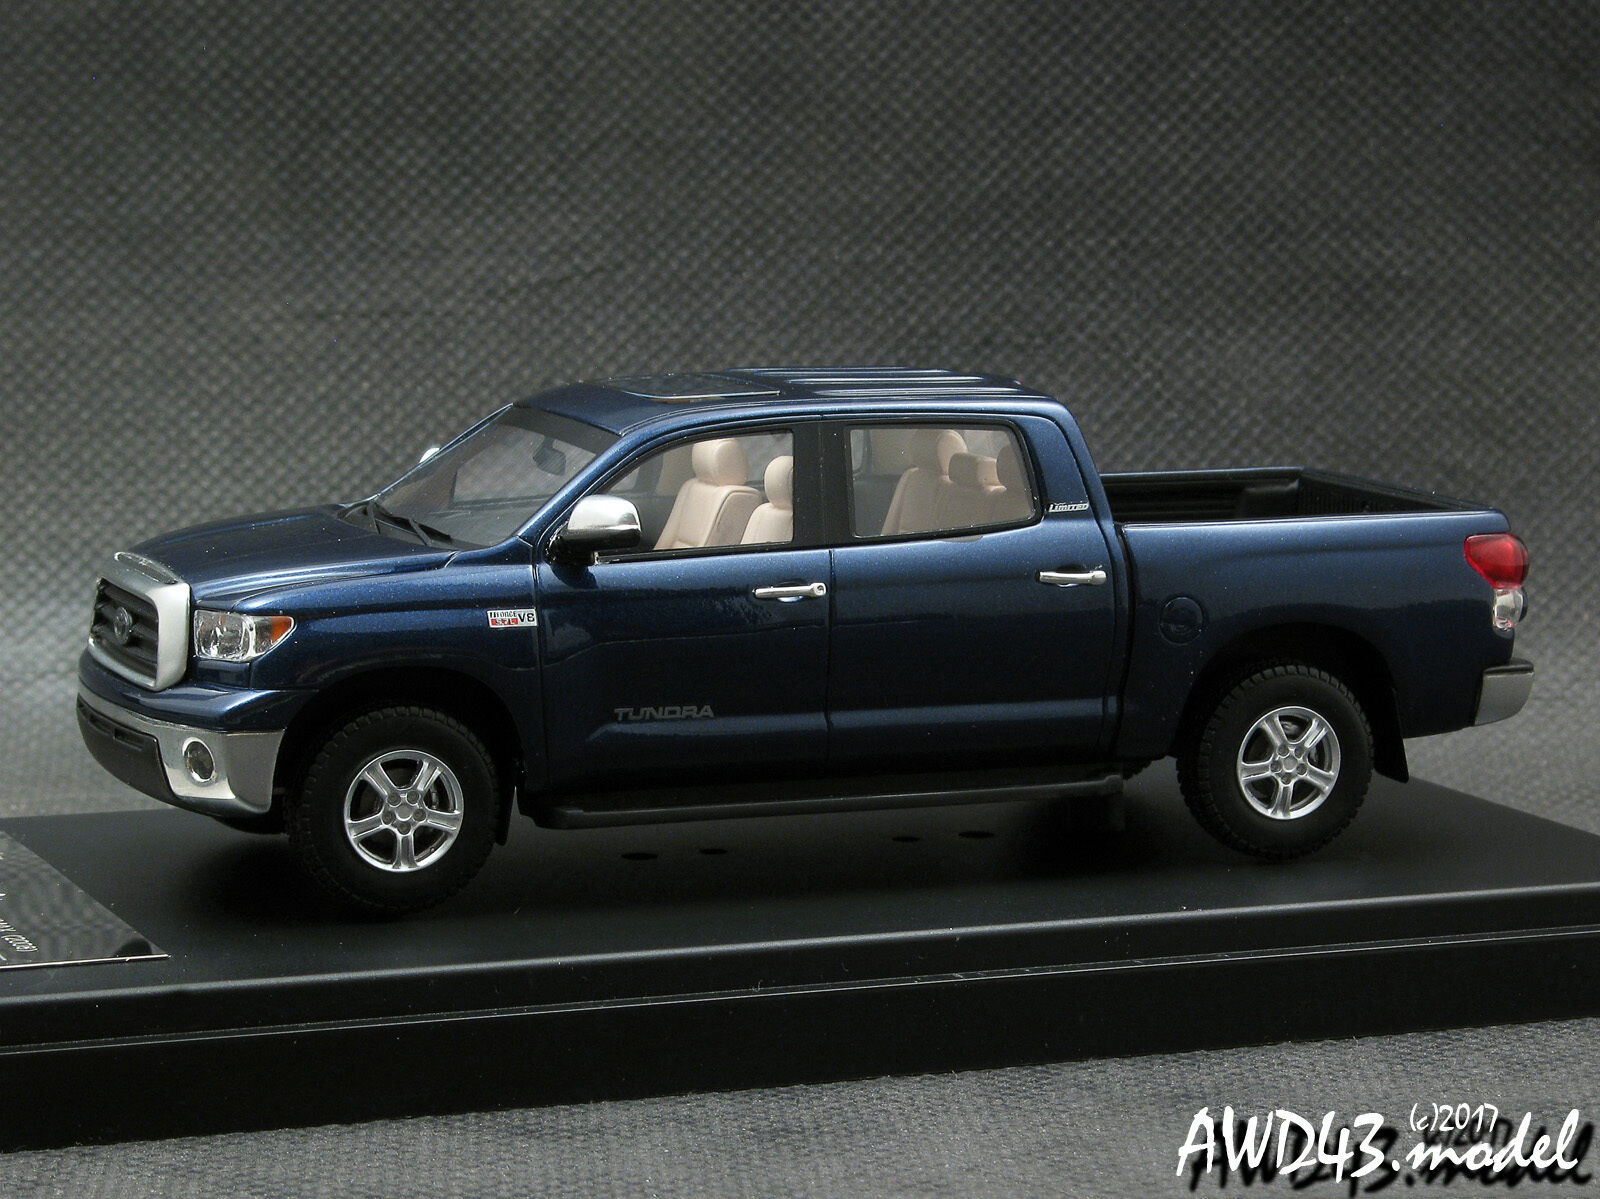 Toyota Tundra Crewmax 2008 (blå eller svkonst) 4x4 4WD 1-43 Hi-Story